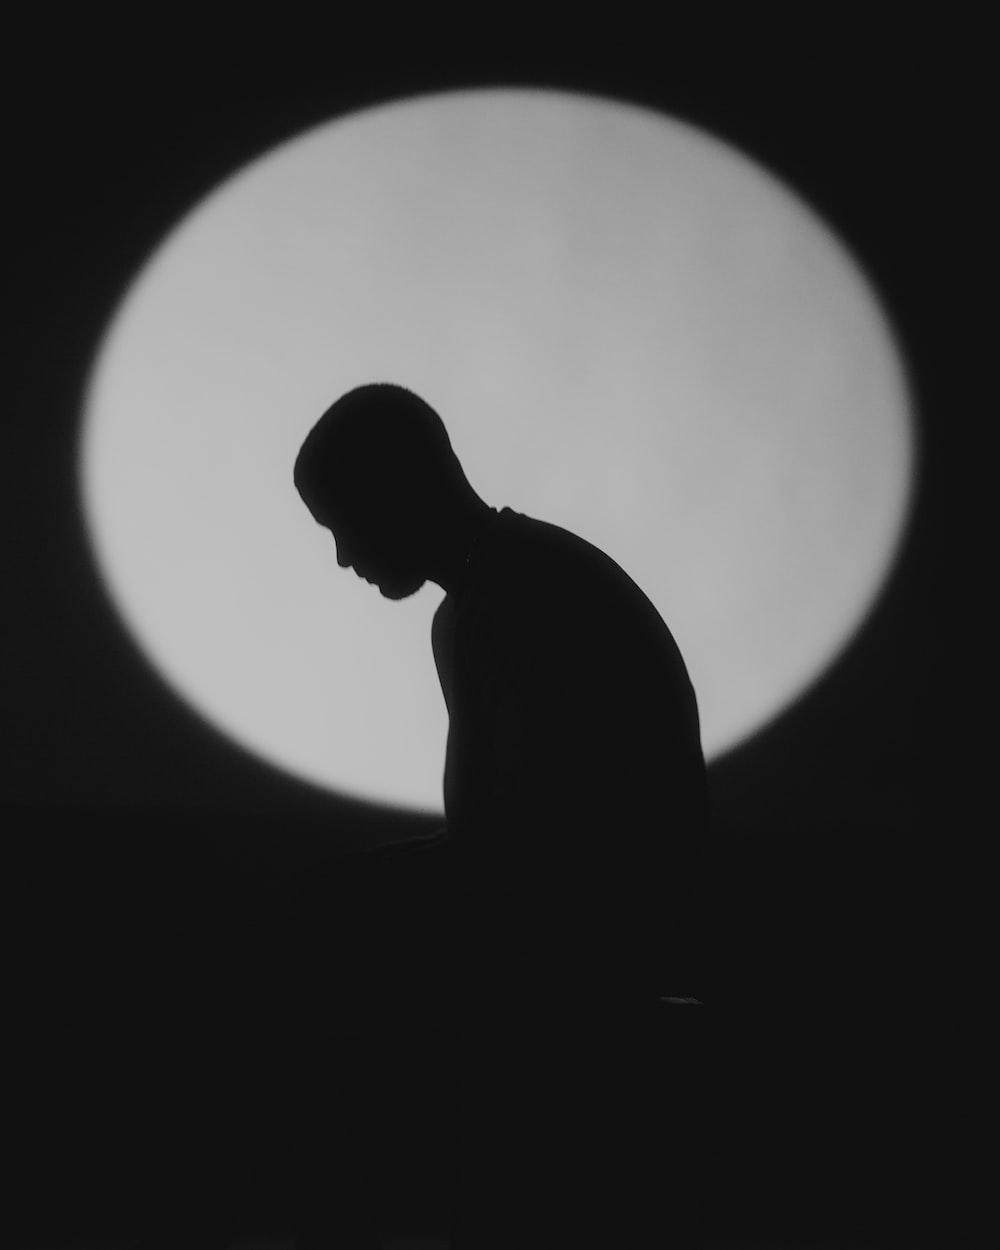 silhouette of man sitting on floor